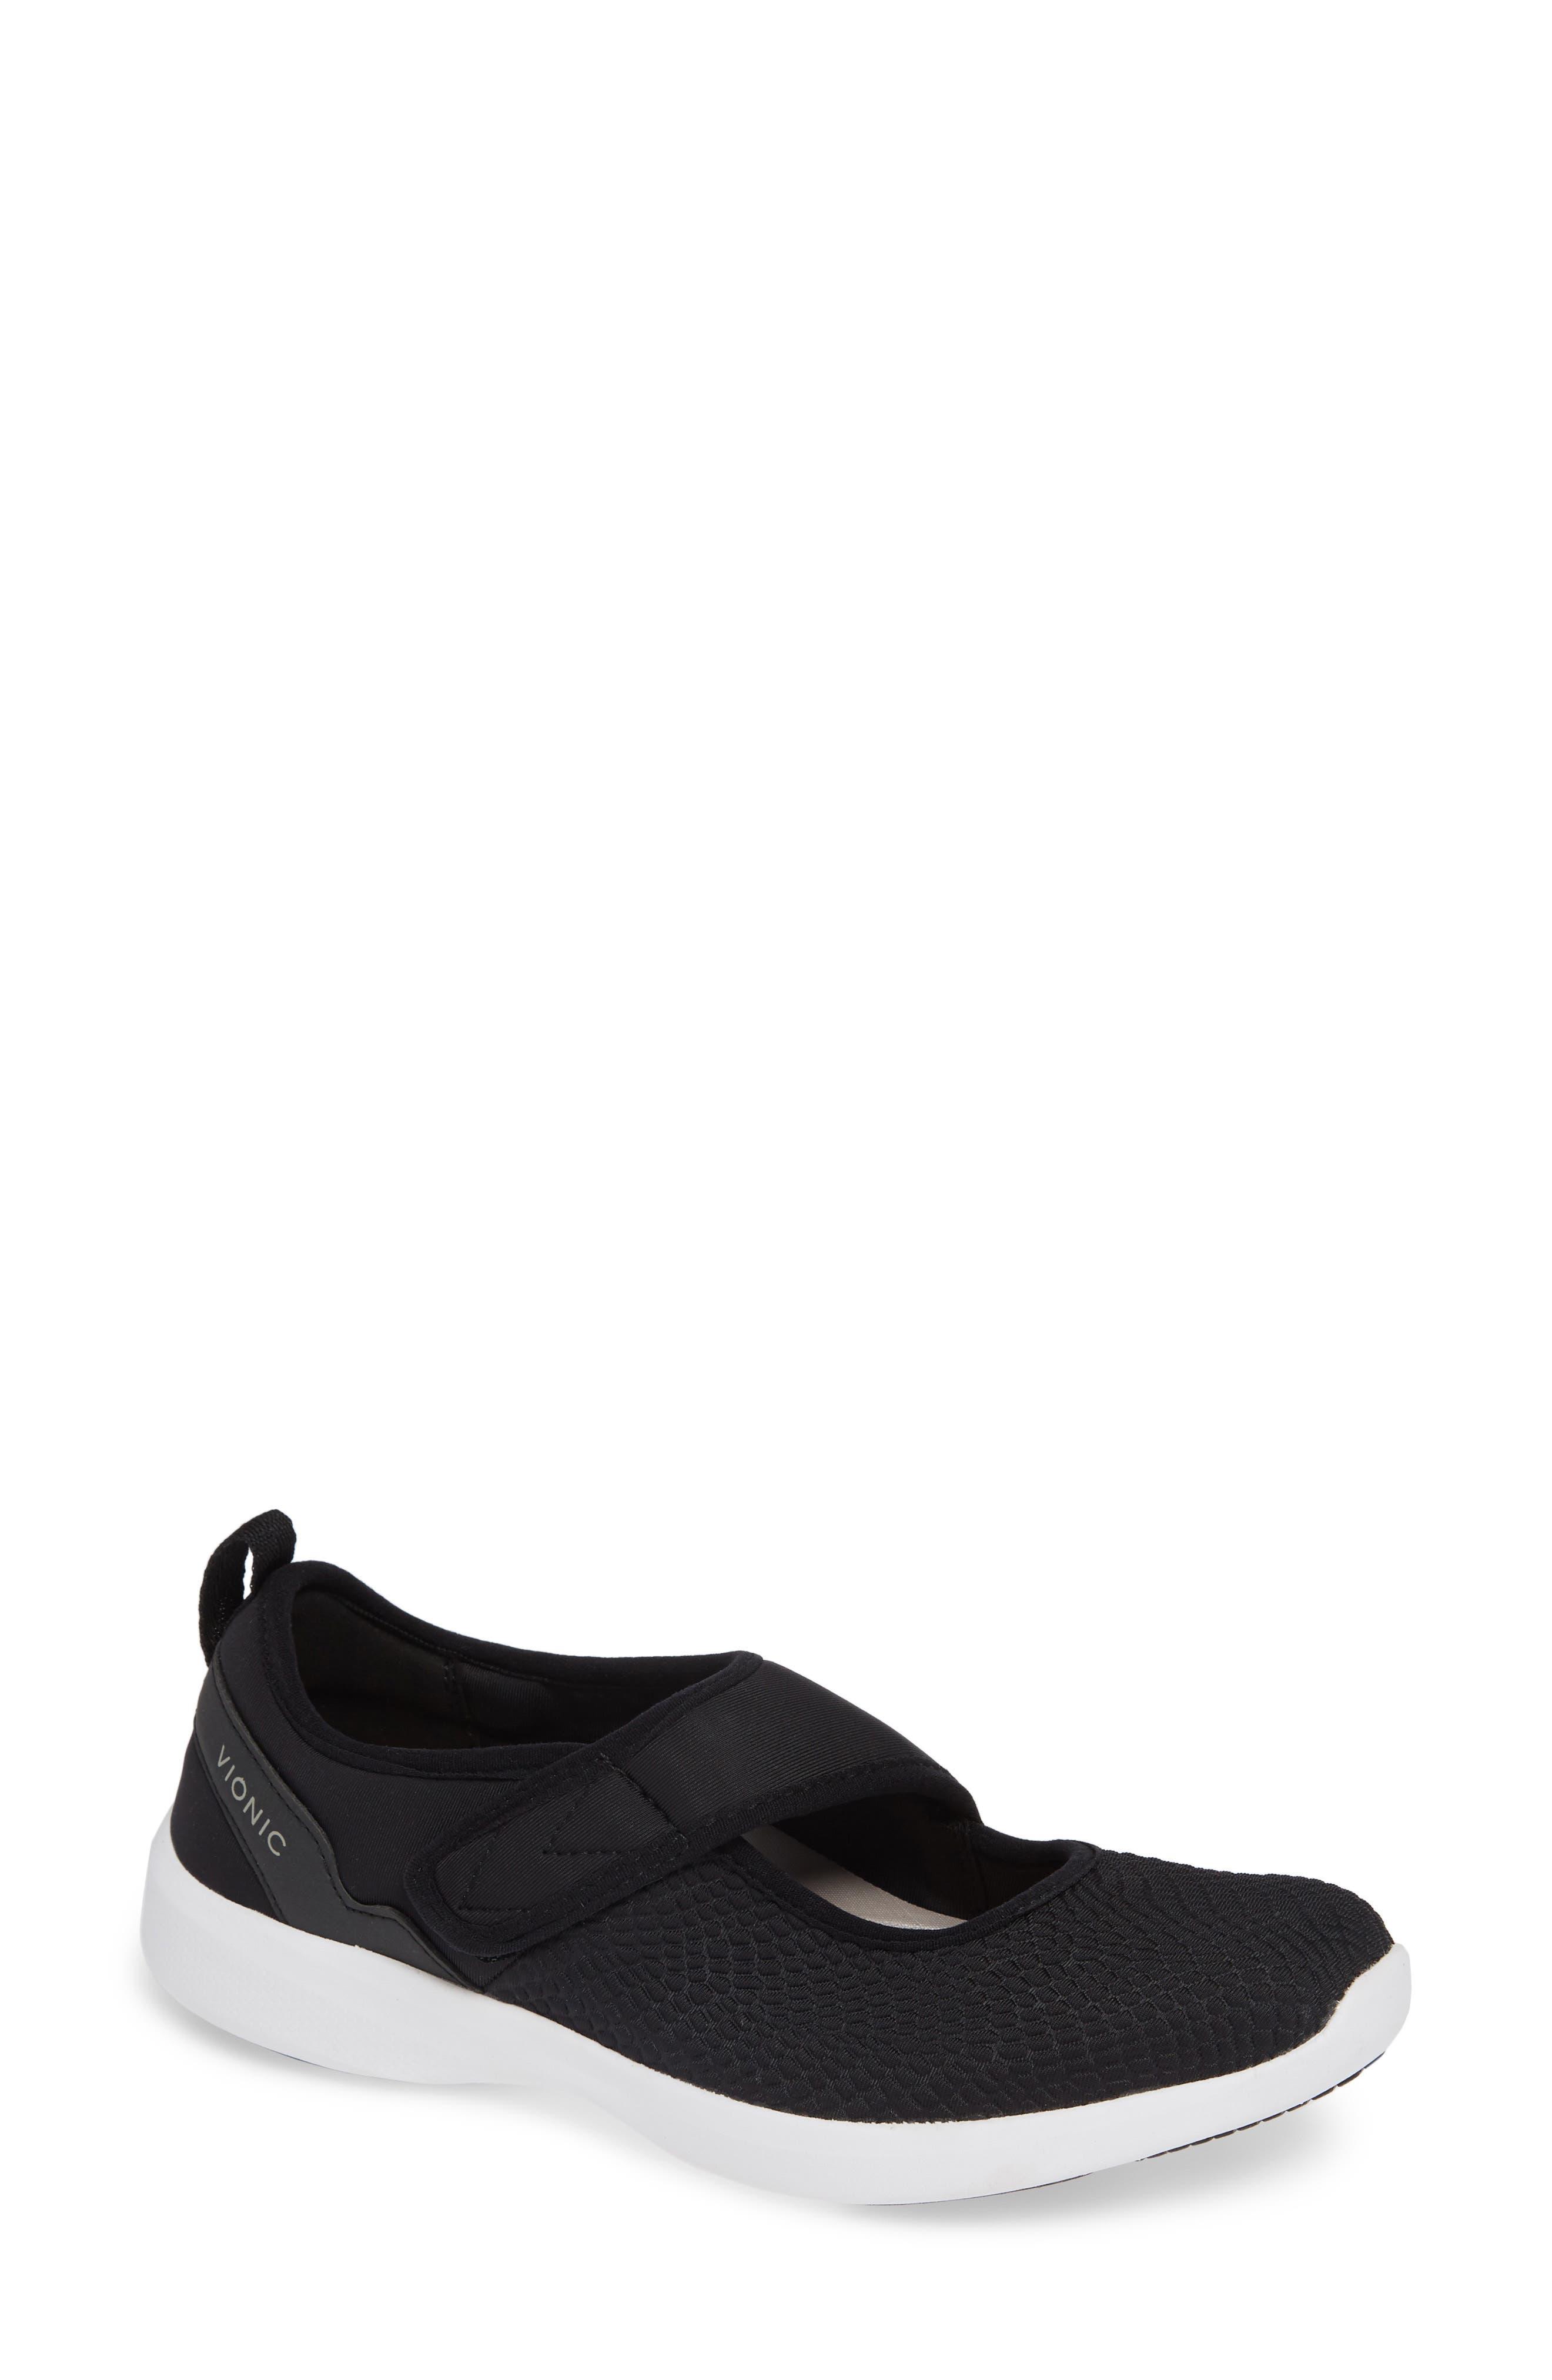 Sonnet Sneaker,                         Main,                         color, BLACK FABRIC